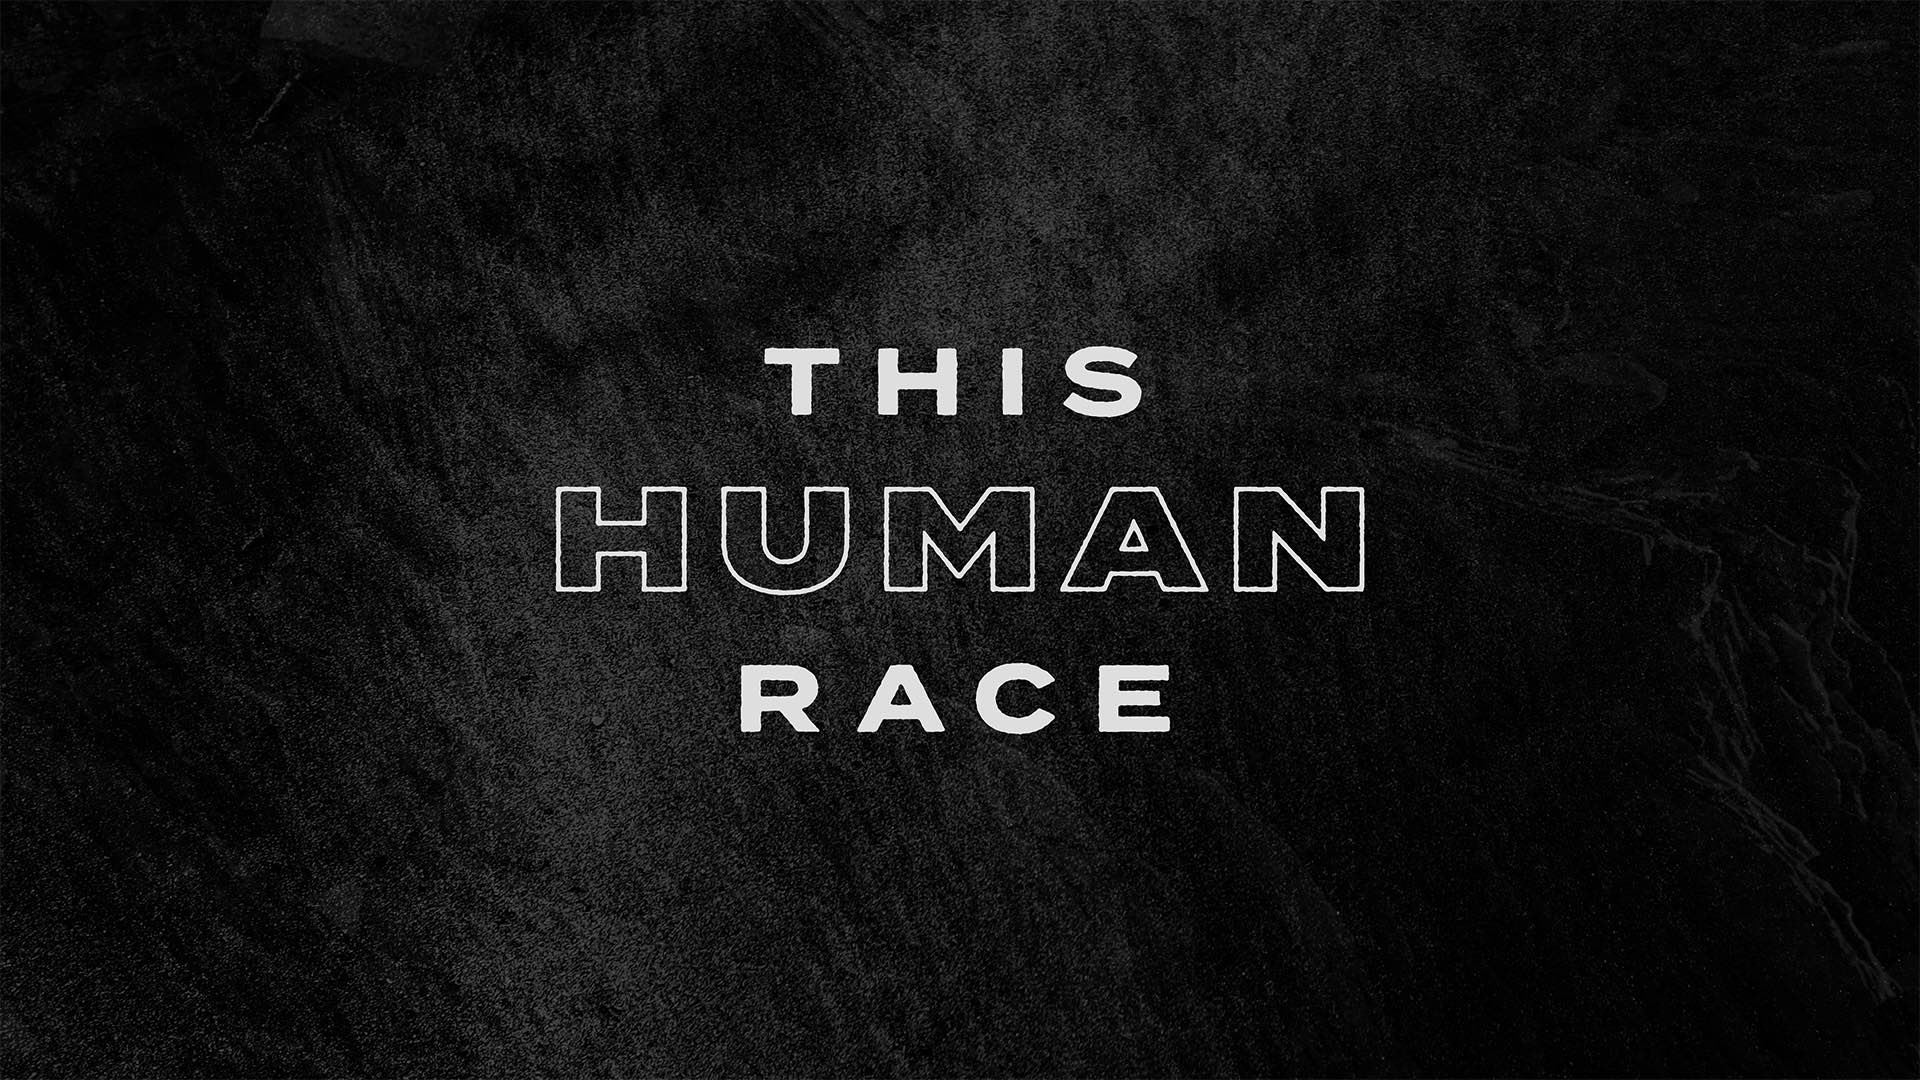 This Human Race